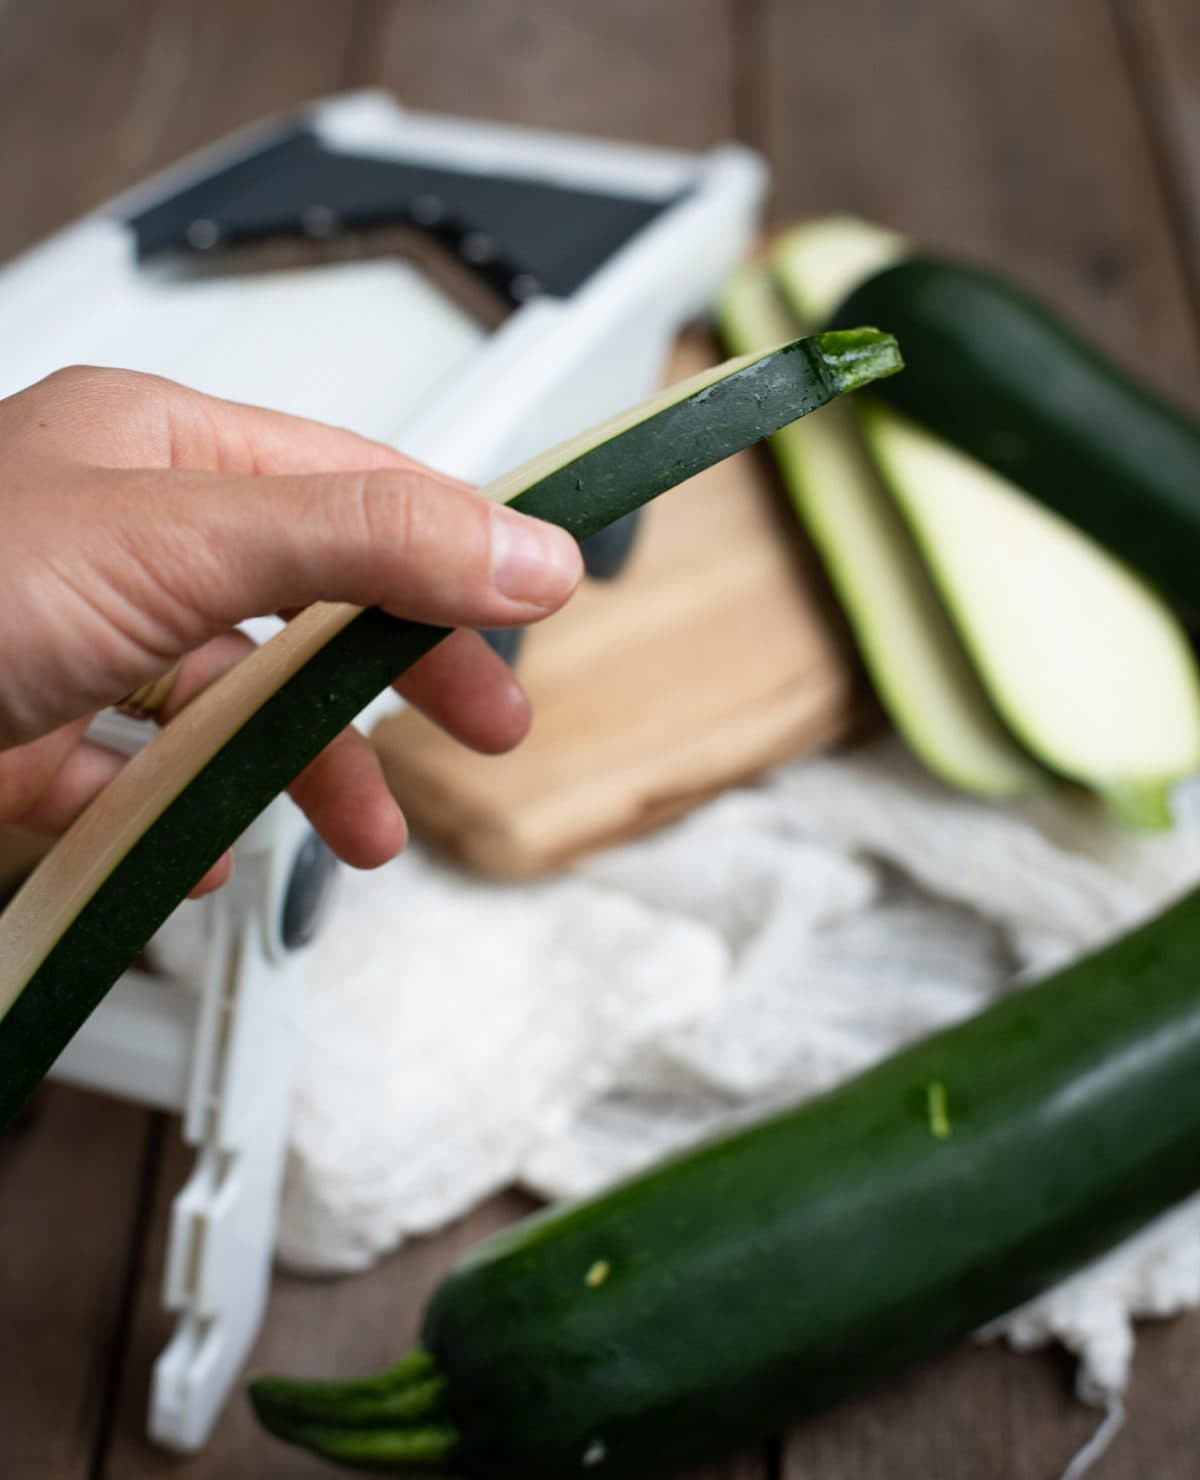 Slice of zucchini made with mandolin slicer